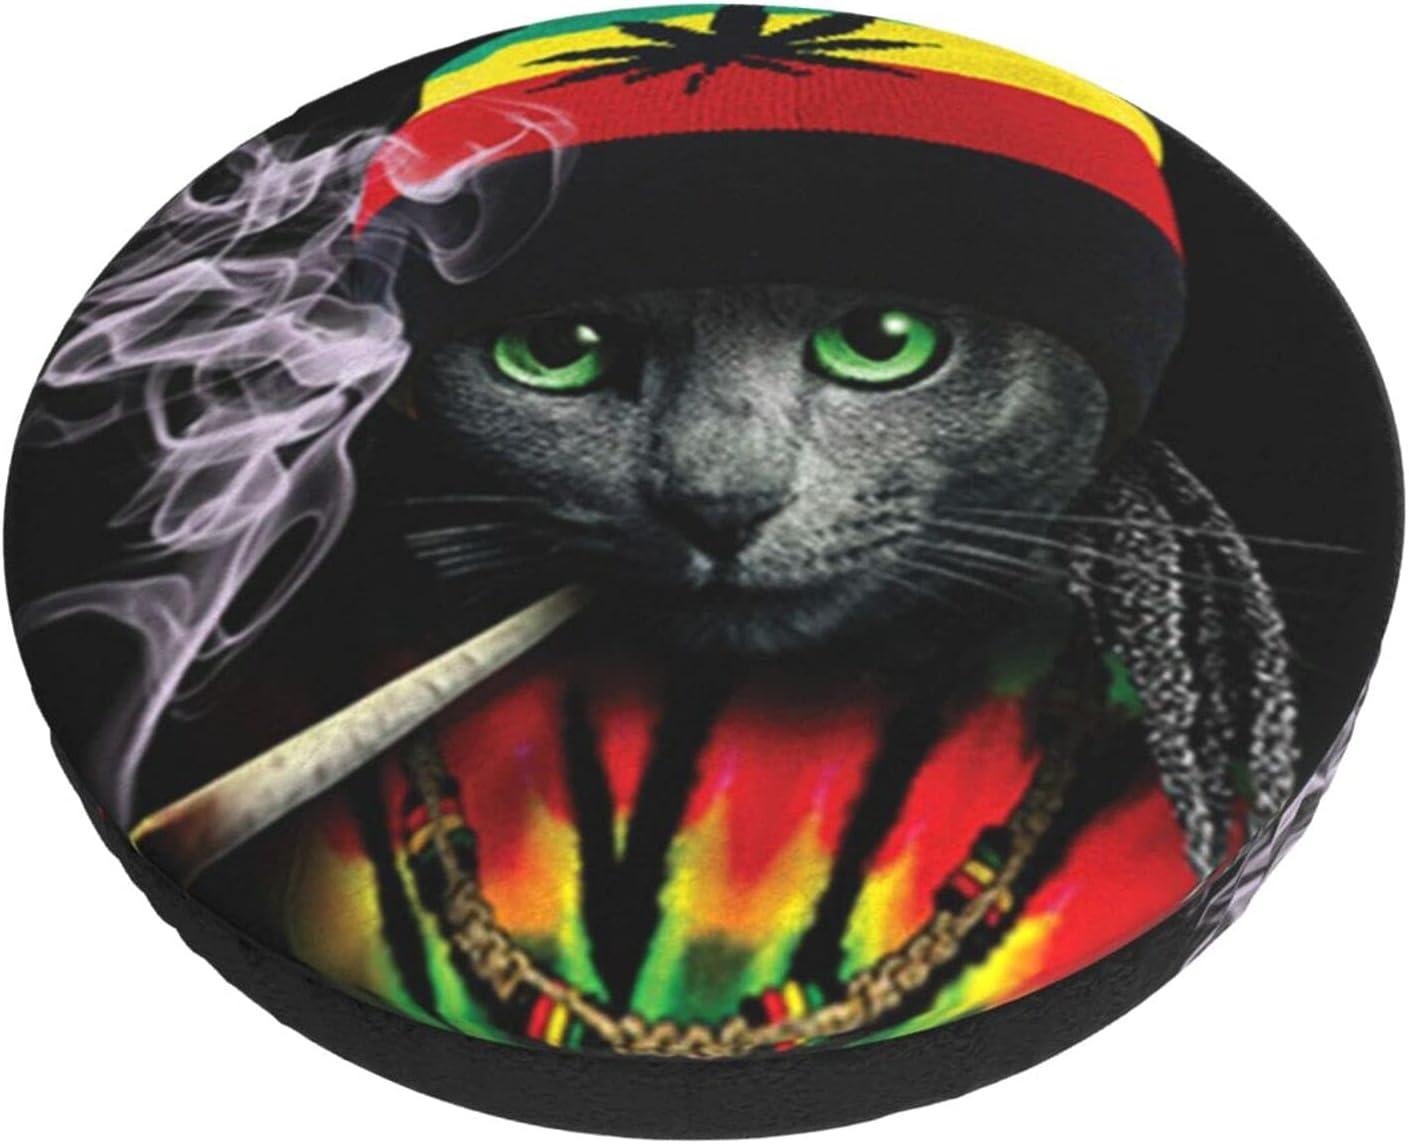 Cat with Marijuana Hat 40% OFF Cheap Sale Smoking Cannabis Stool C Very popular Round Bar Lounge